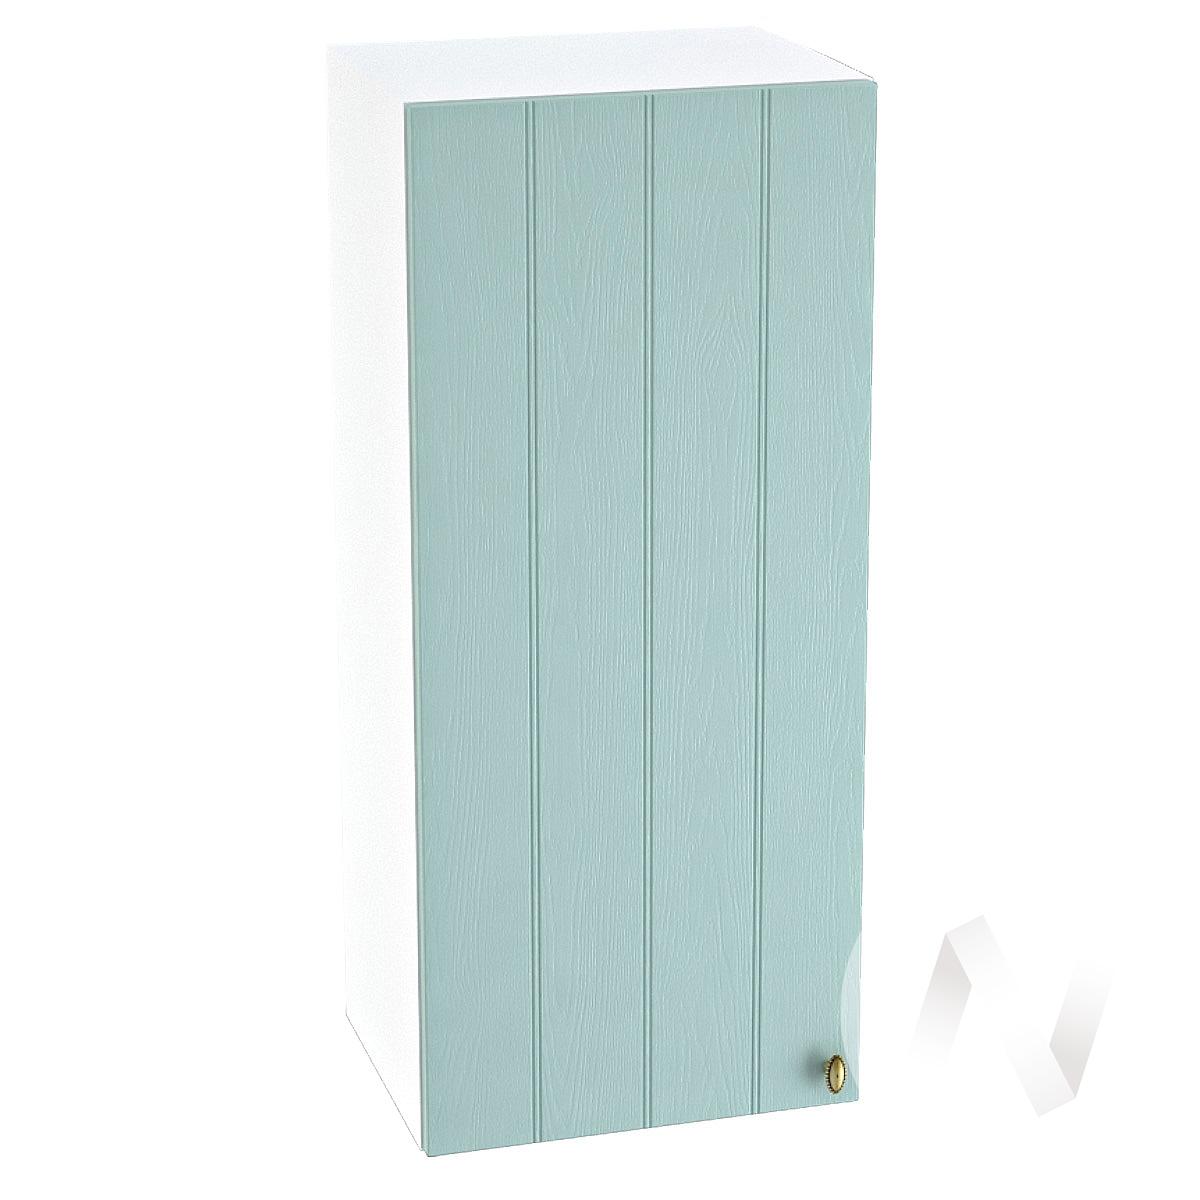 "Кухня ""Прованс"": Шкаф верхний 409, ШВ 409 (голубой/корпус белый)"